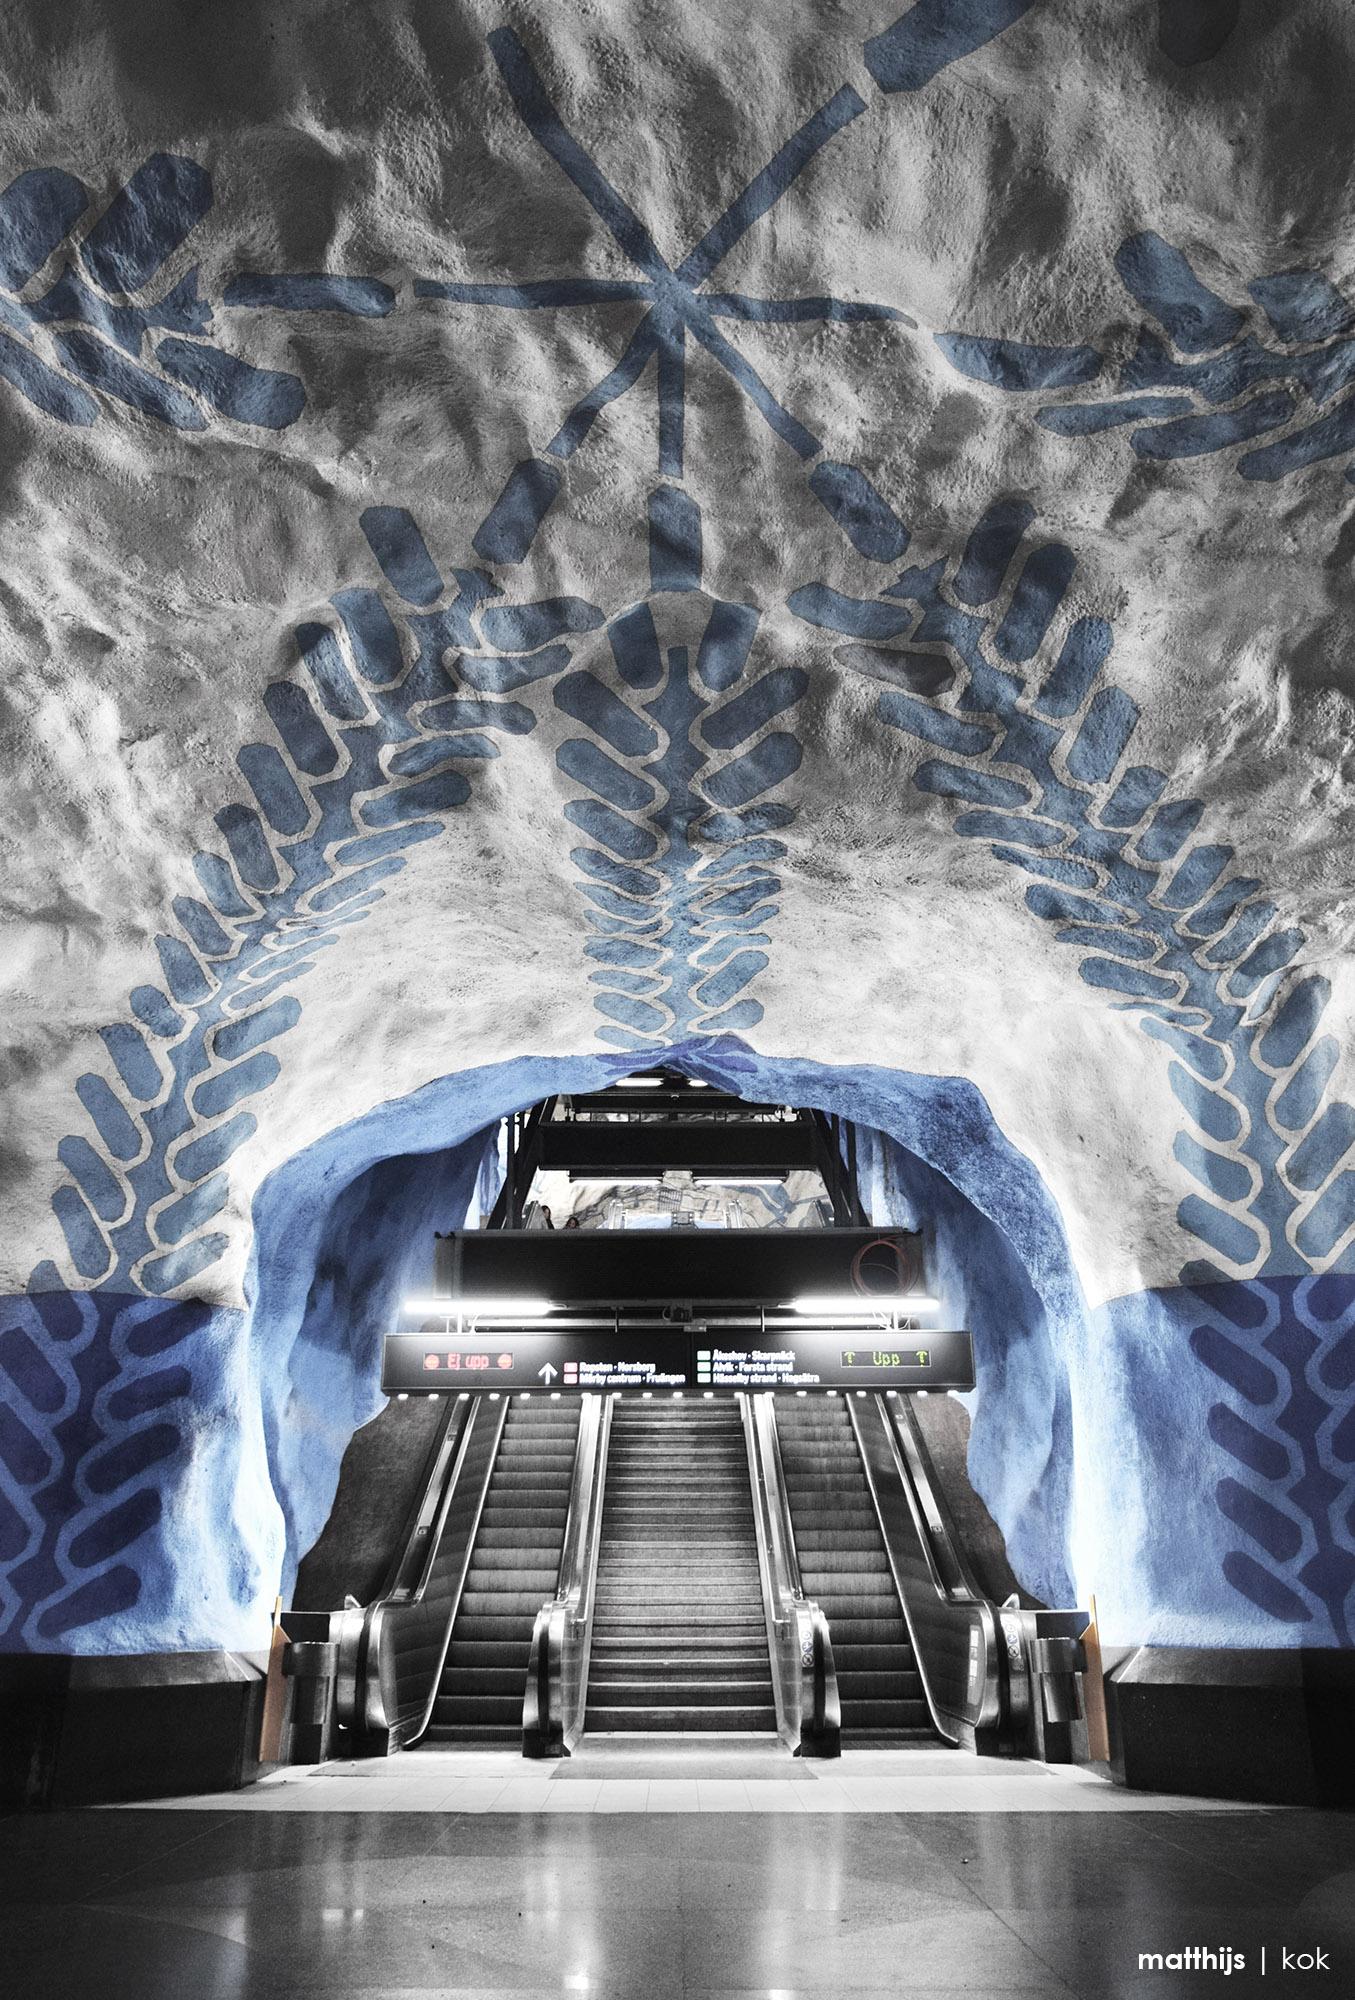 T-Centralen Subway Station, Stockholm, Sweden | Photo by Matthijs Kok